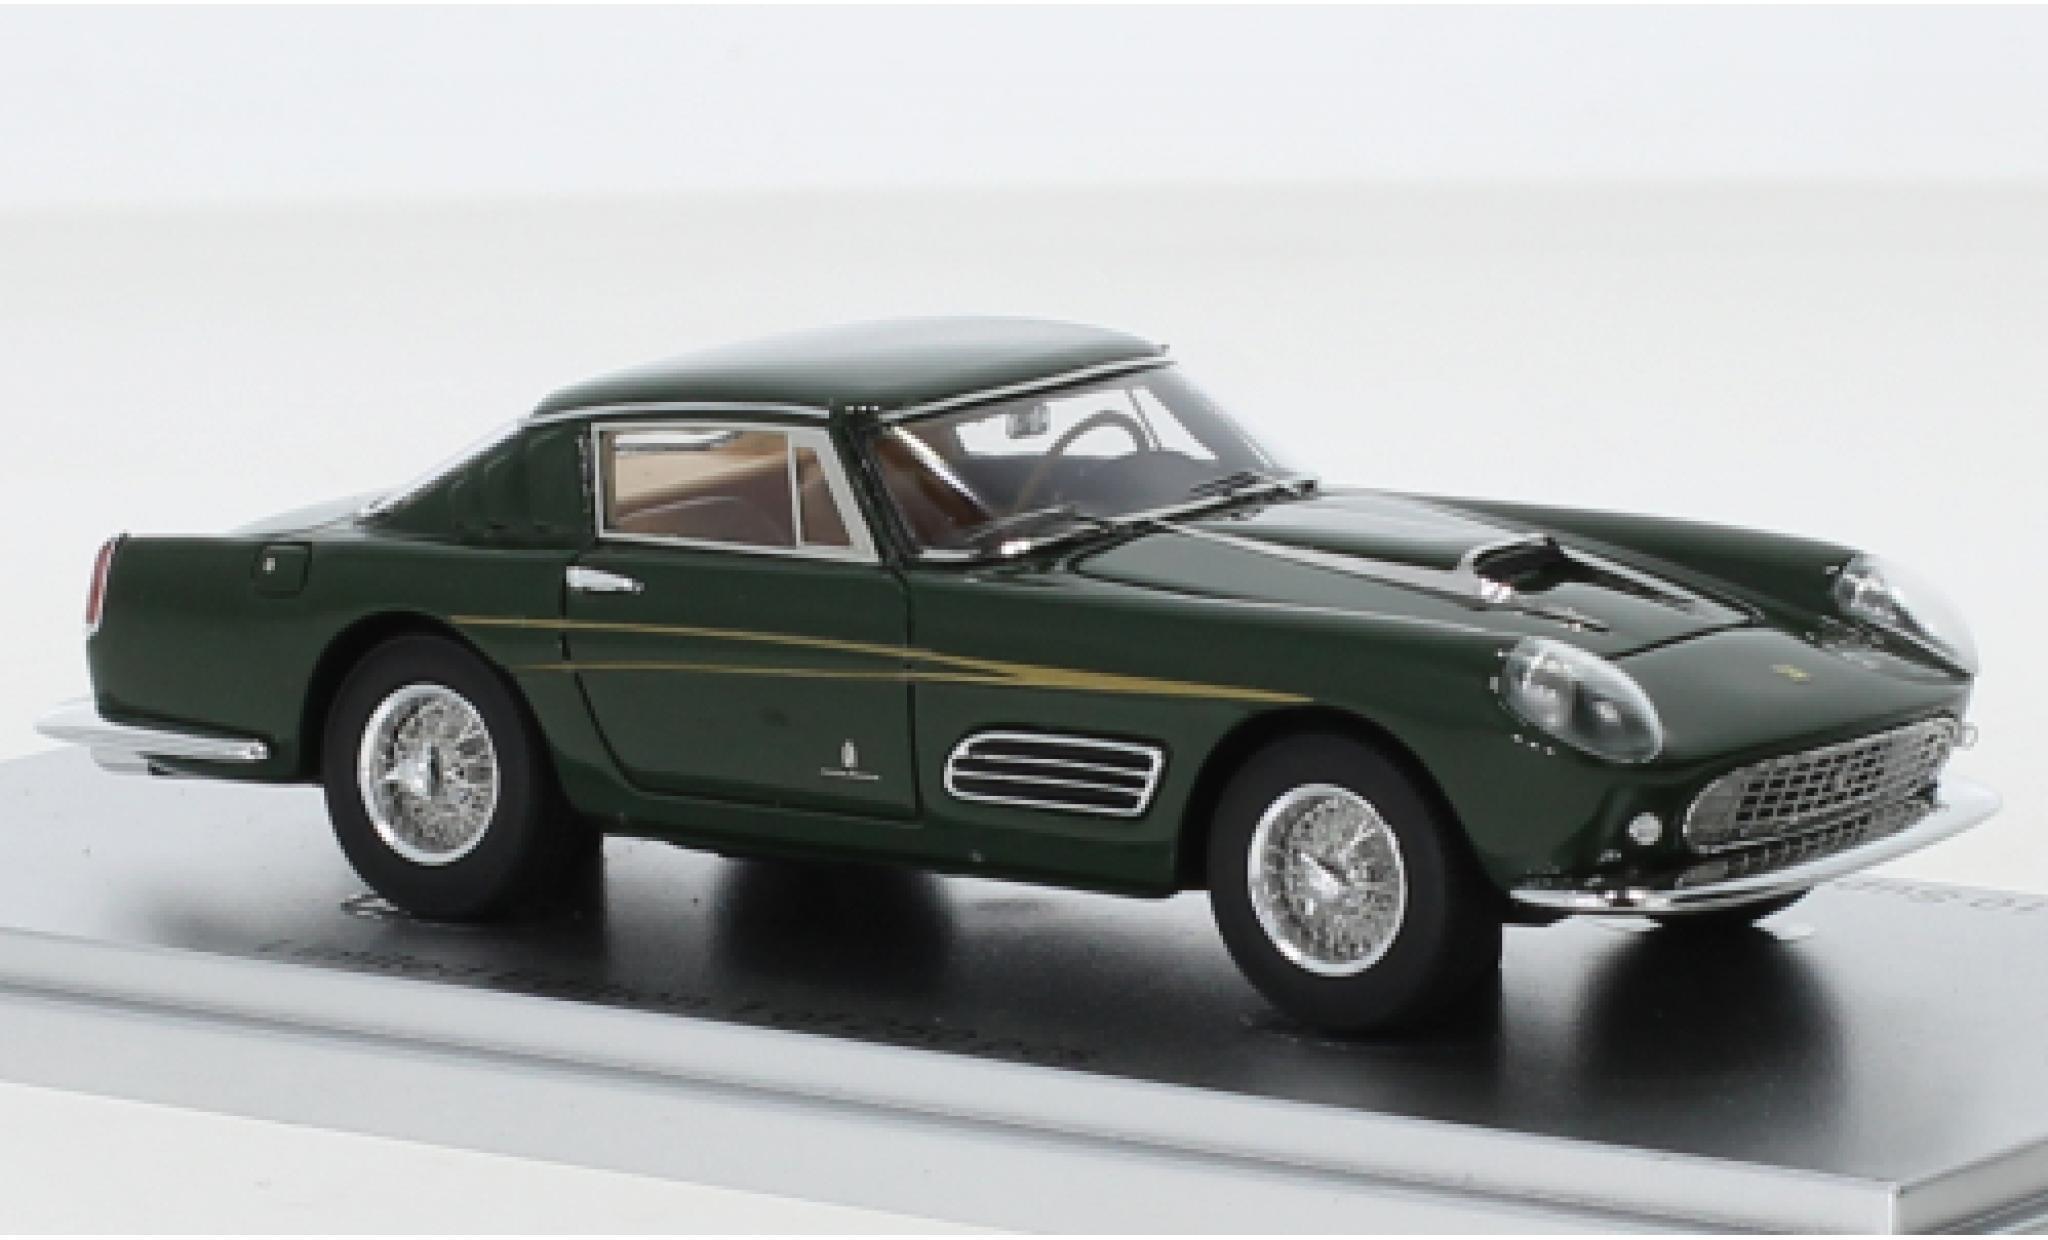 Ferrari 410 1/43 Kess Superamerica Series III Pininfarina Coupe green/gold 1958